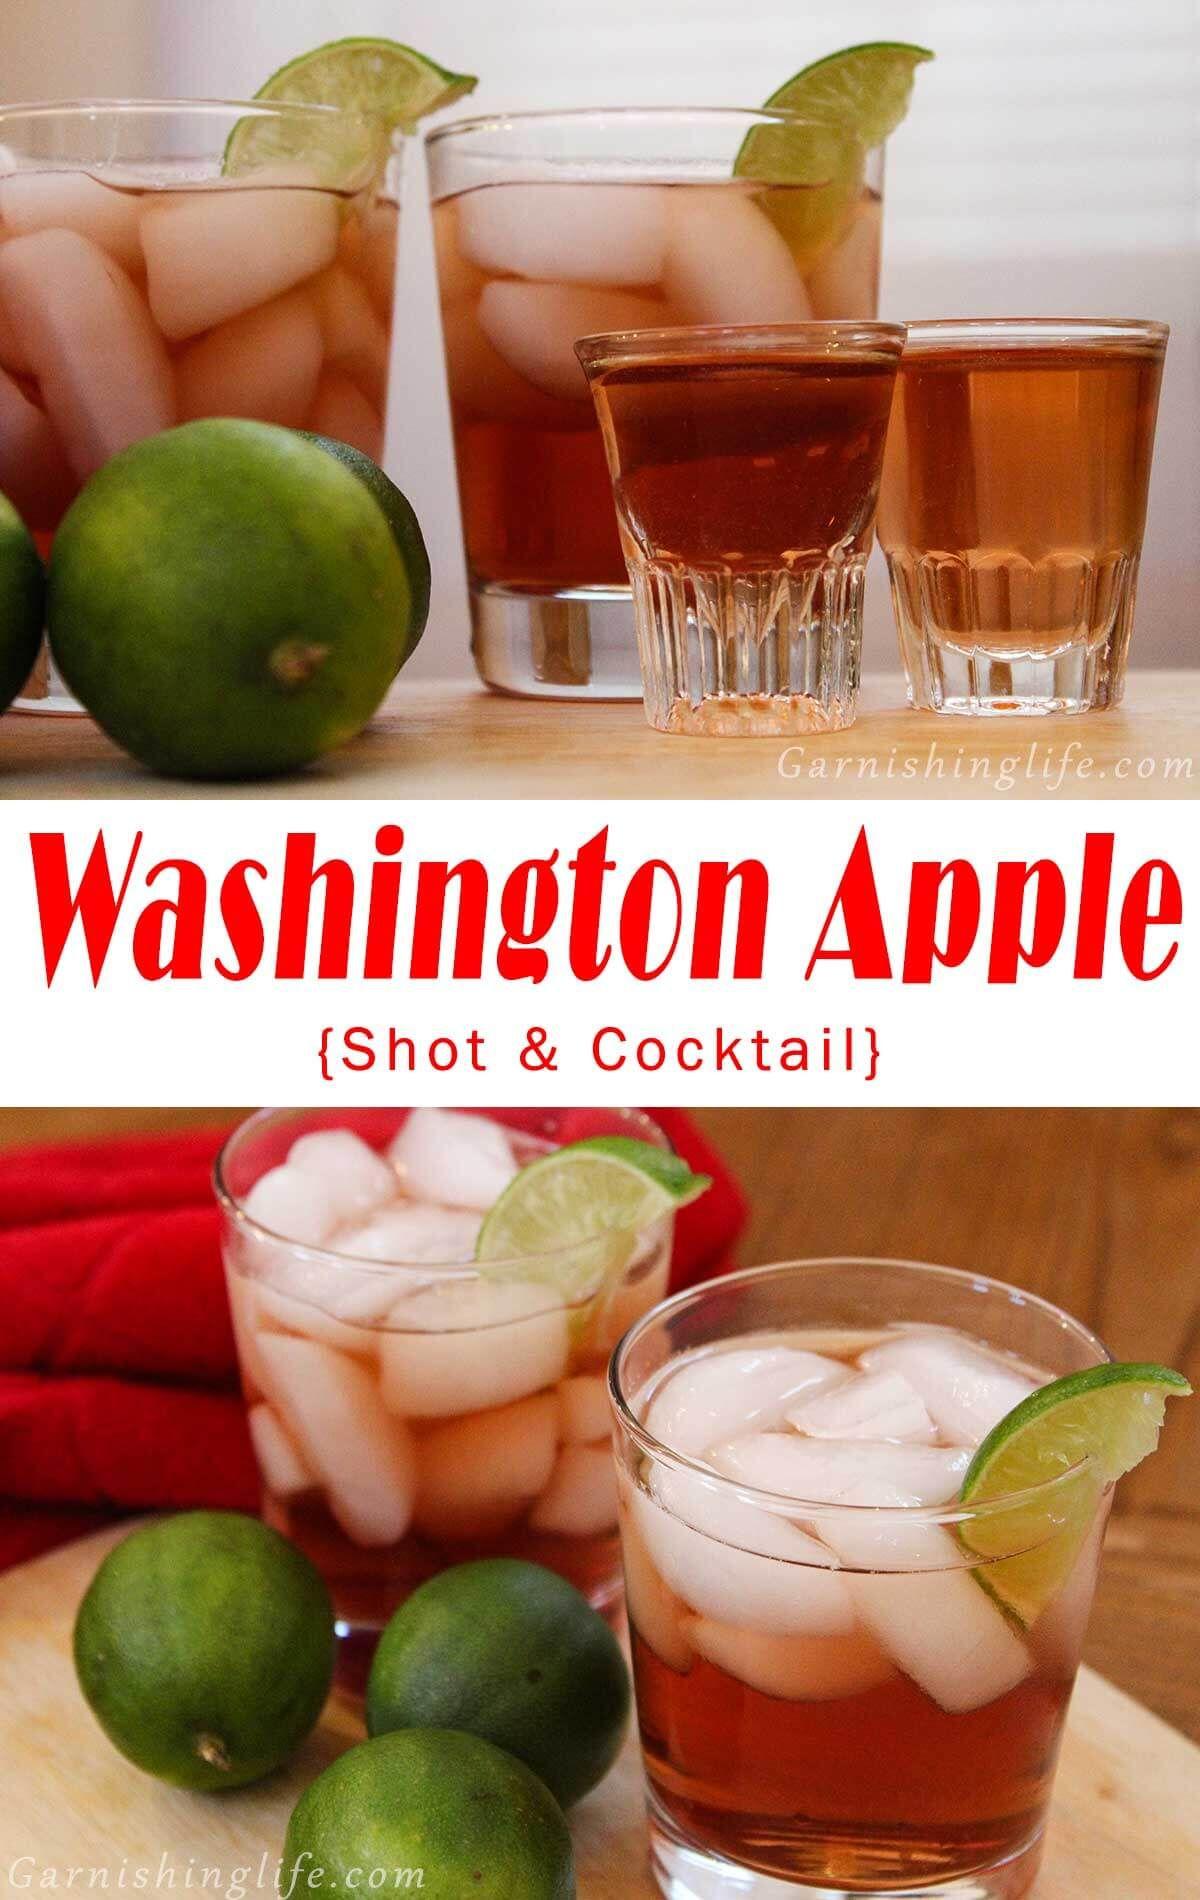 Washington Apple Recipe In 2020 Washington Apple Washington Apple Shot Apple Shots,Easy Cold Sandwich Recipes